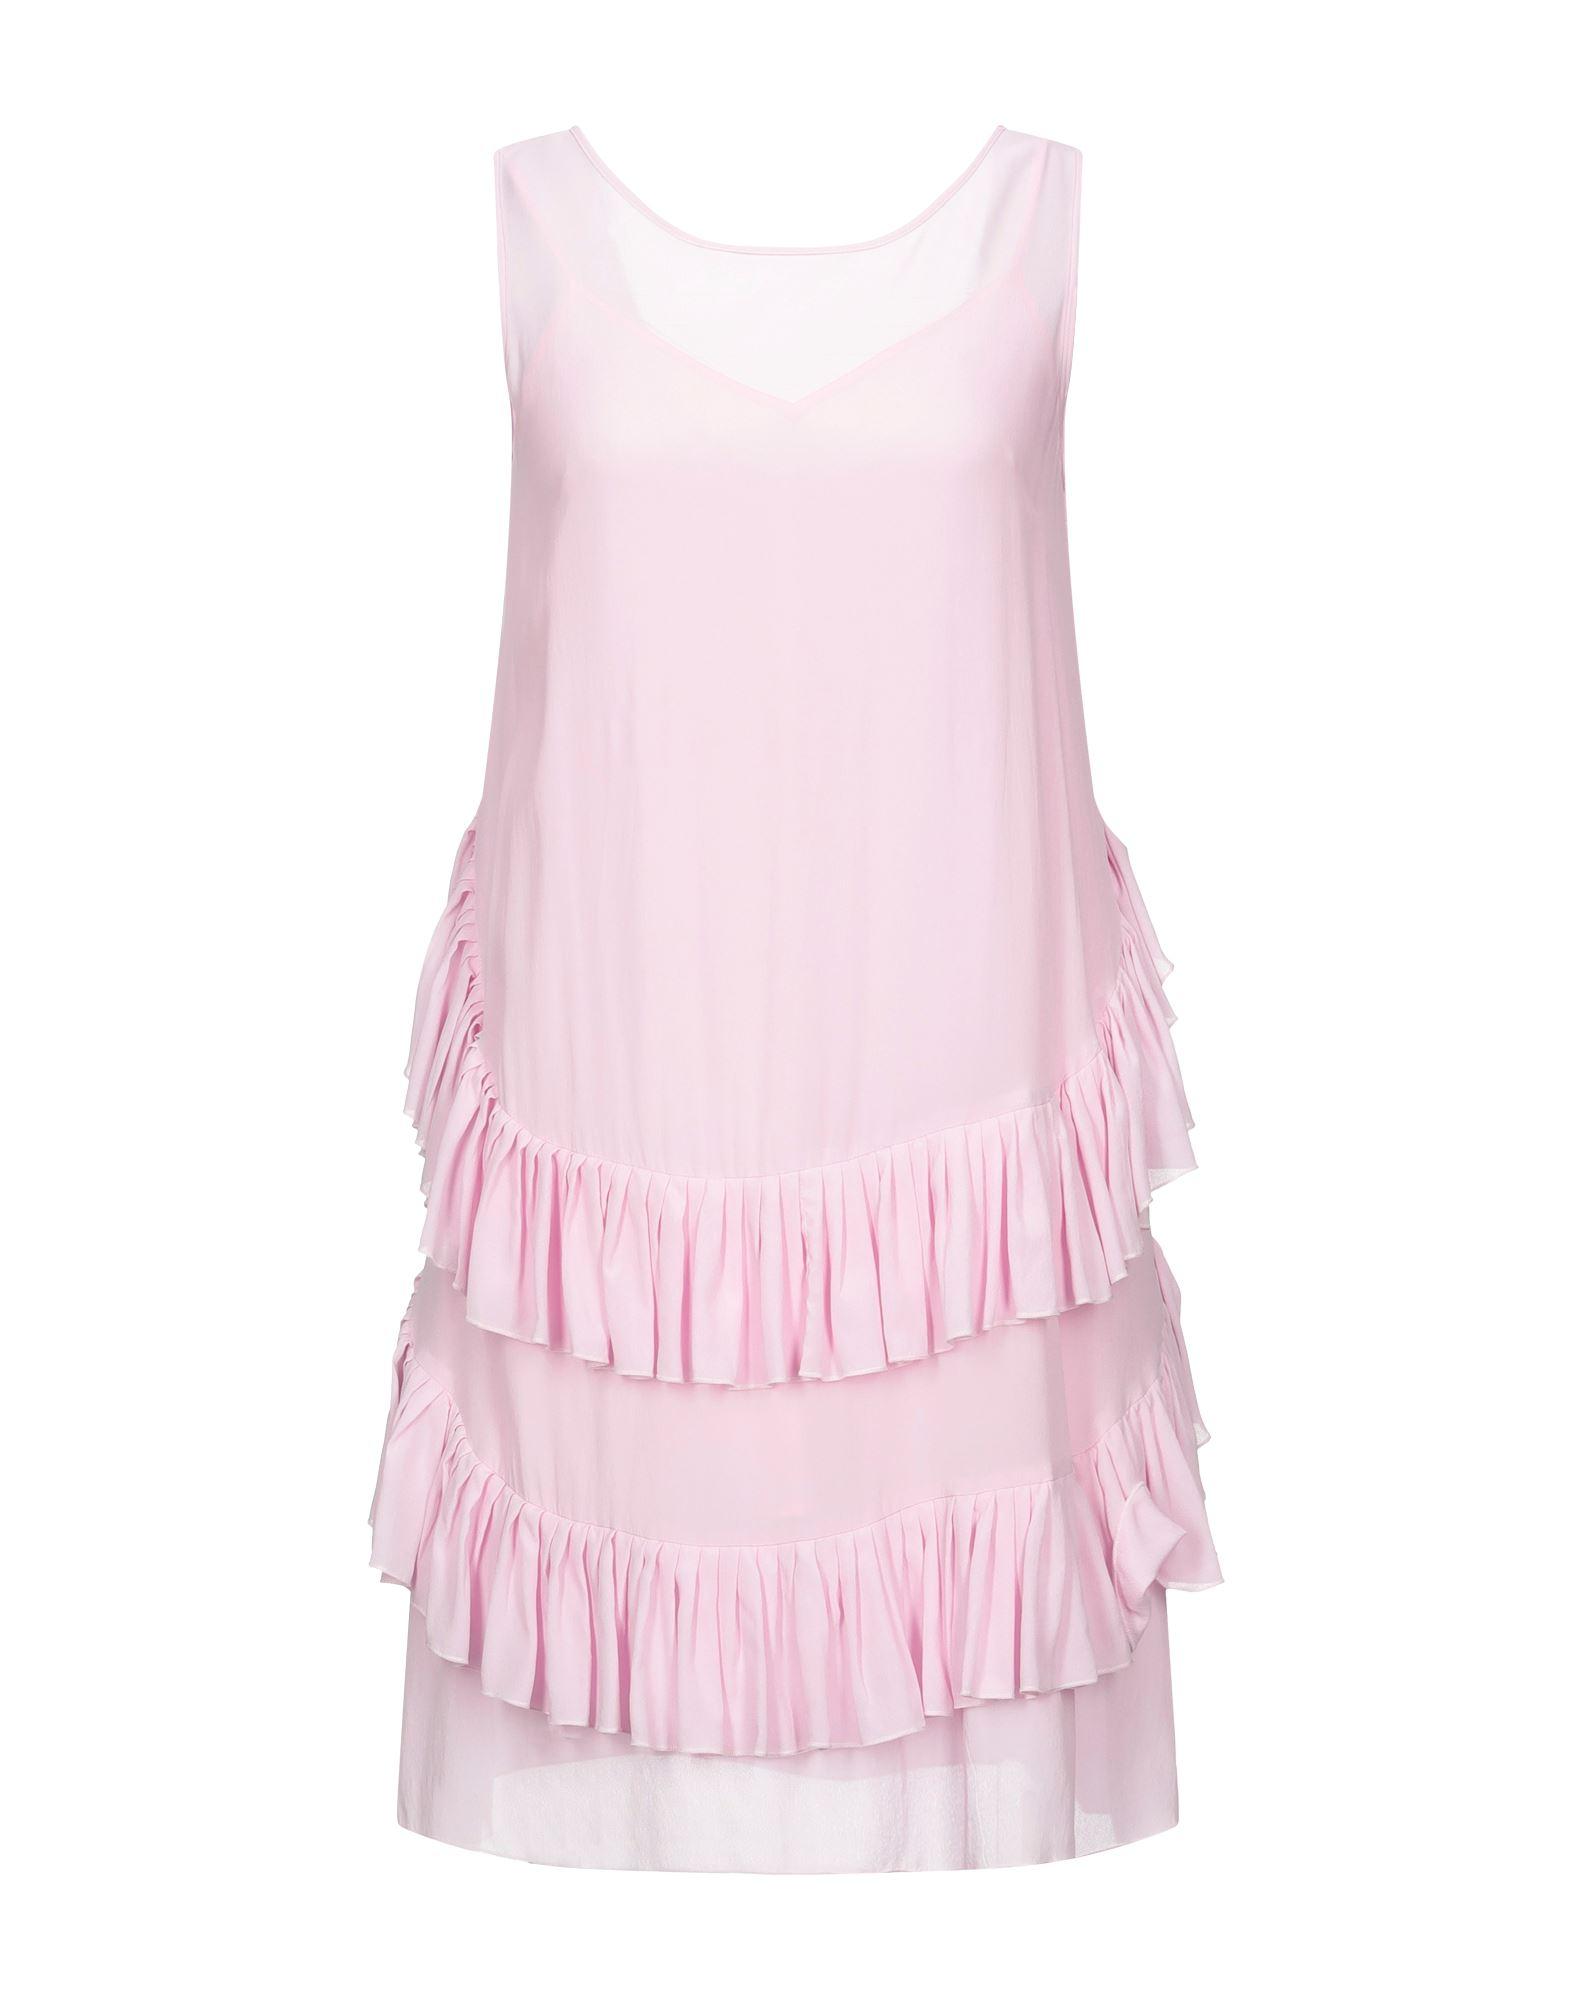 Фото - ISABELLE BLANCHE Paris Короткое платье isabelle blanche paris платье миди